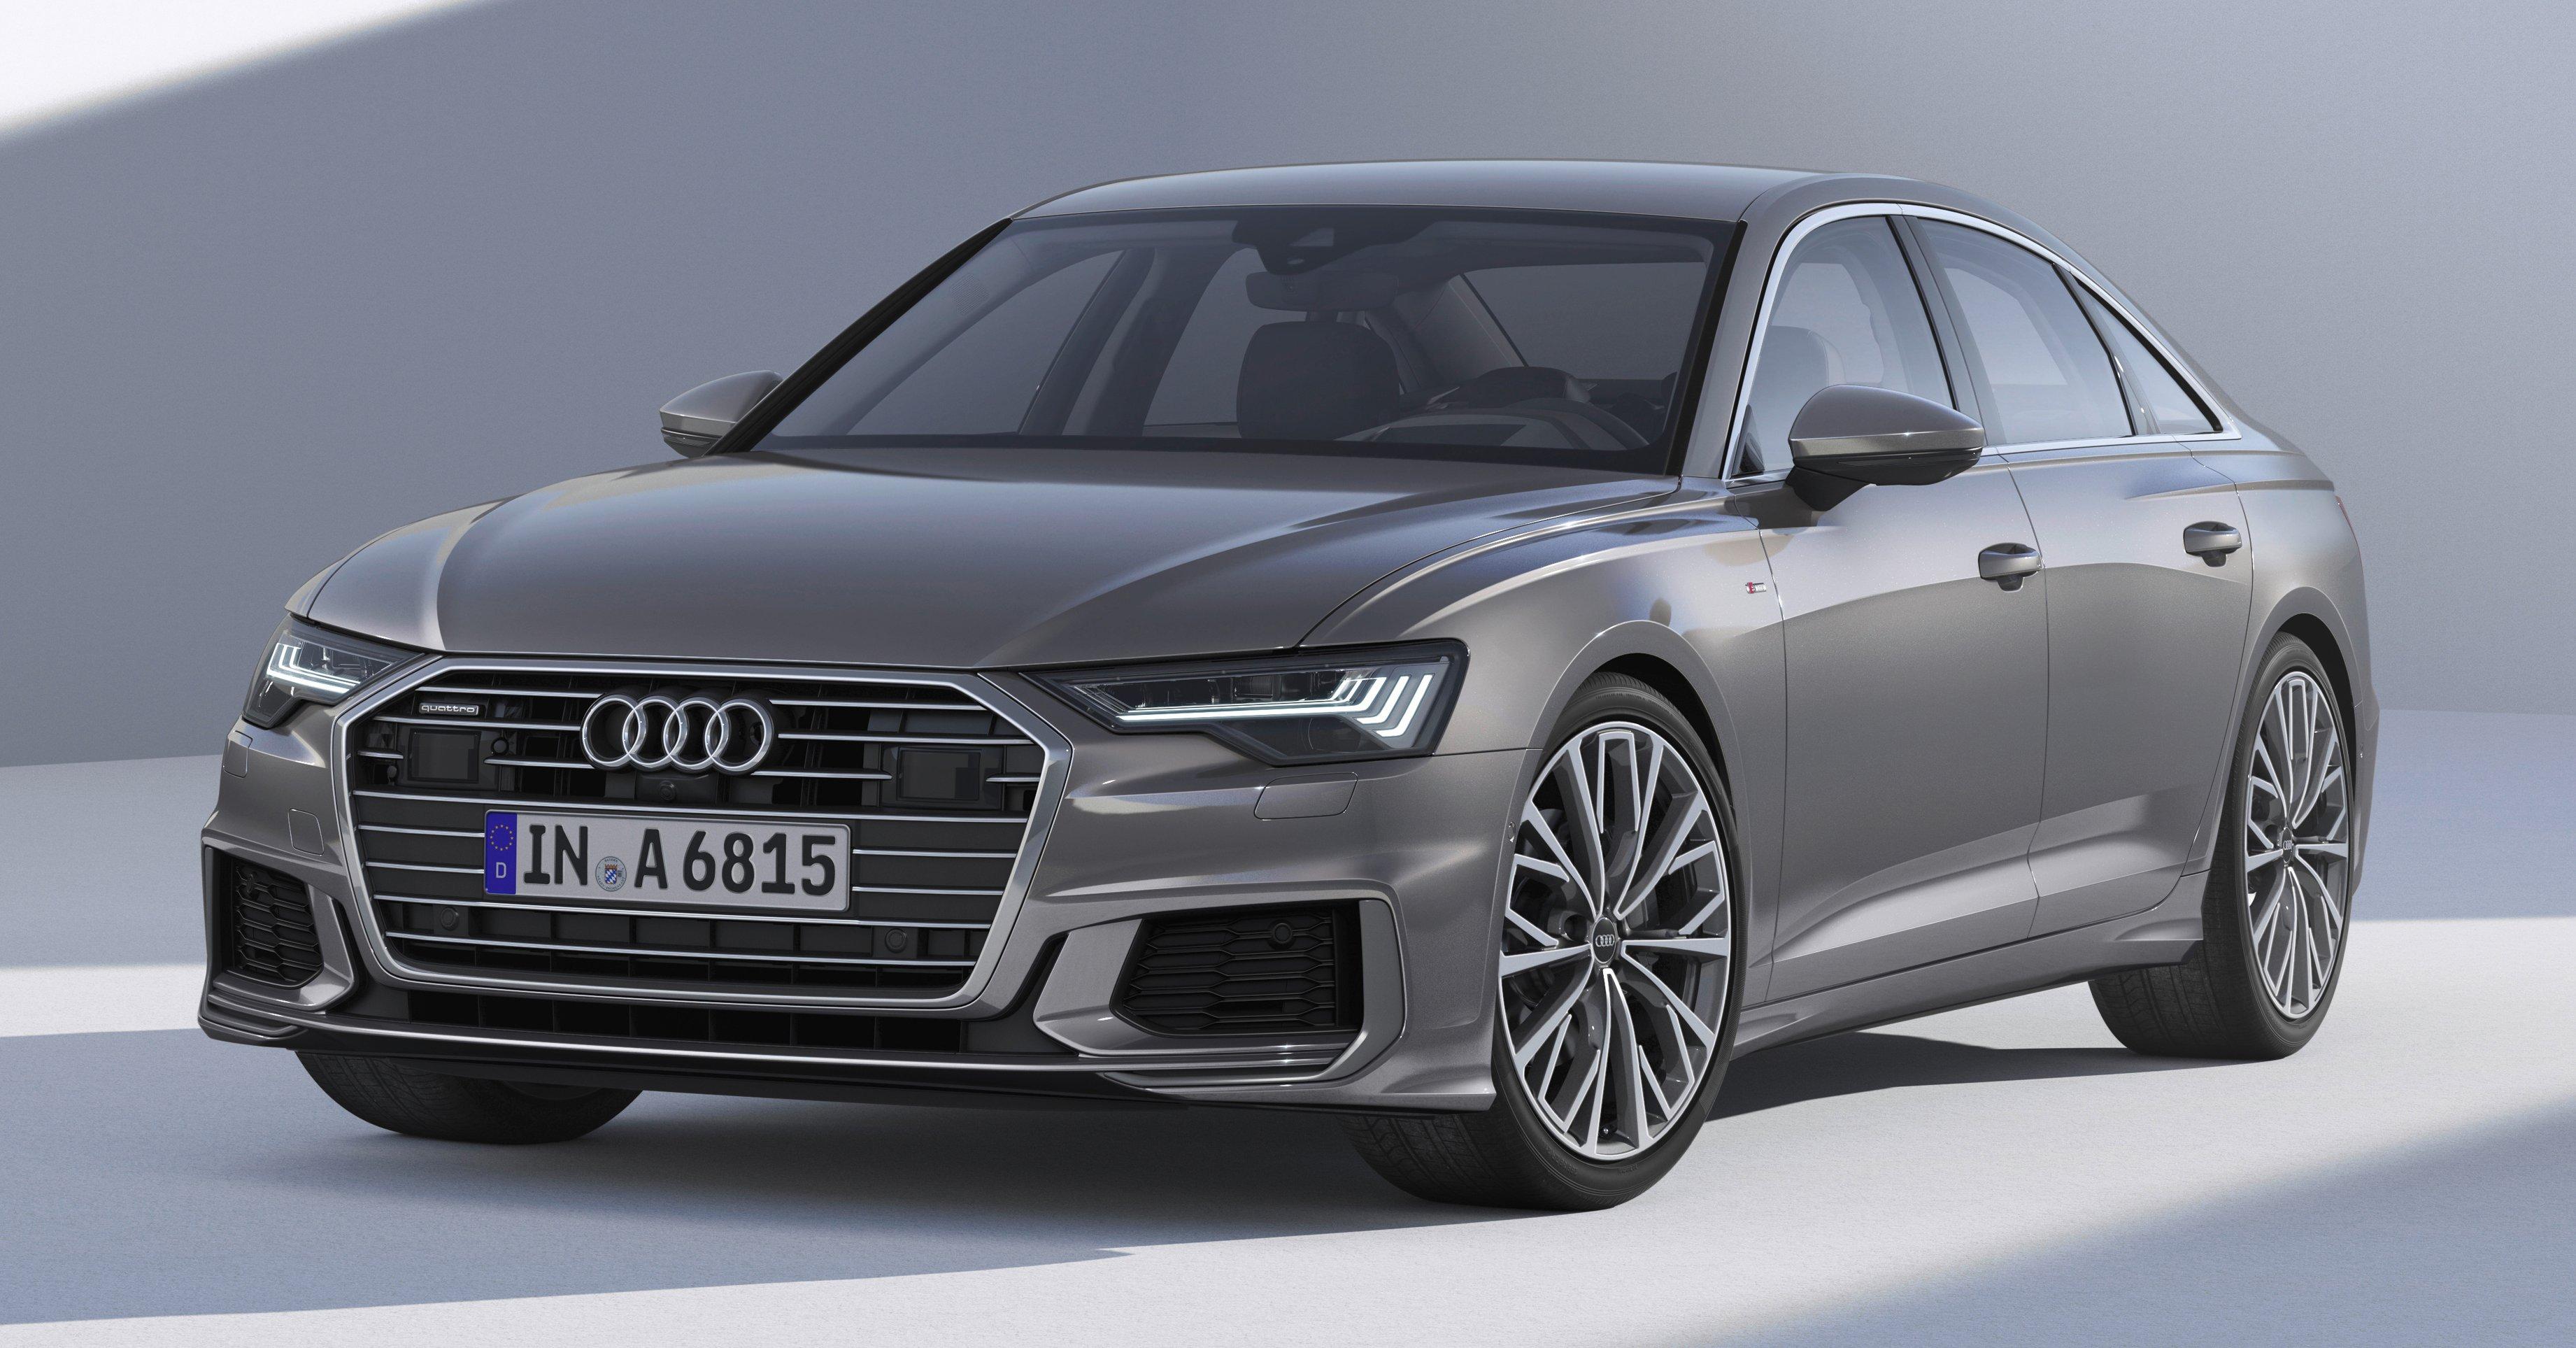 Kelebihan Audi Q6 Top Model Tahun Ini